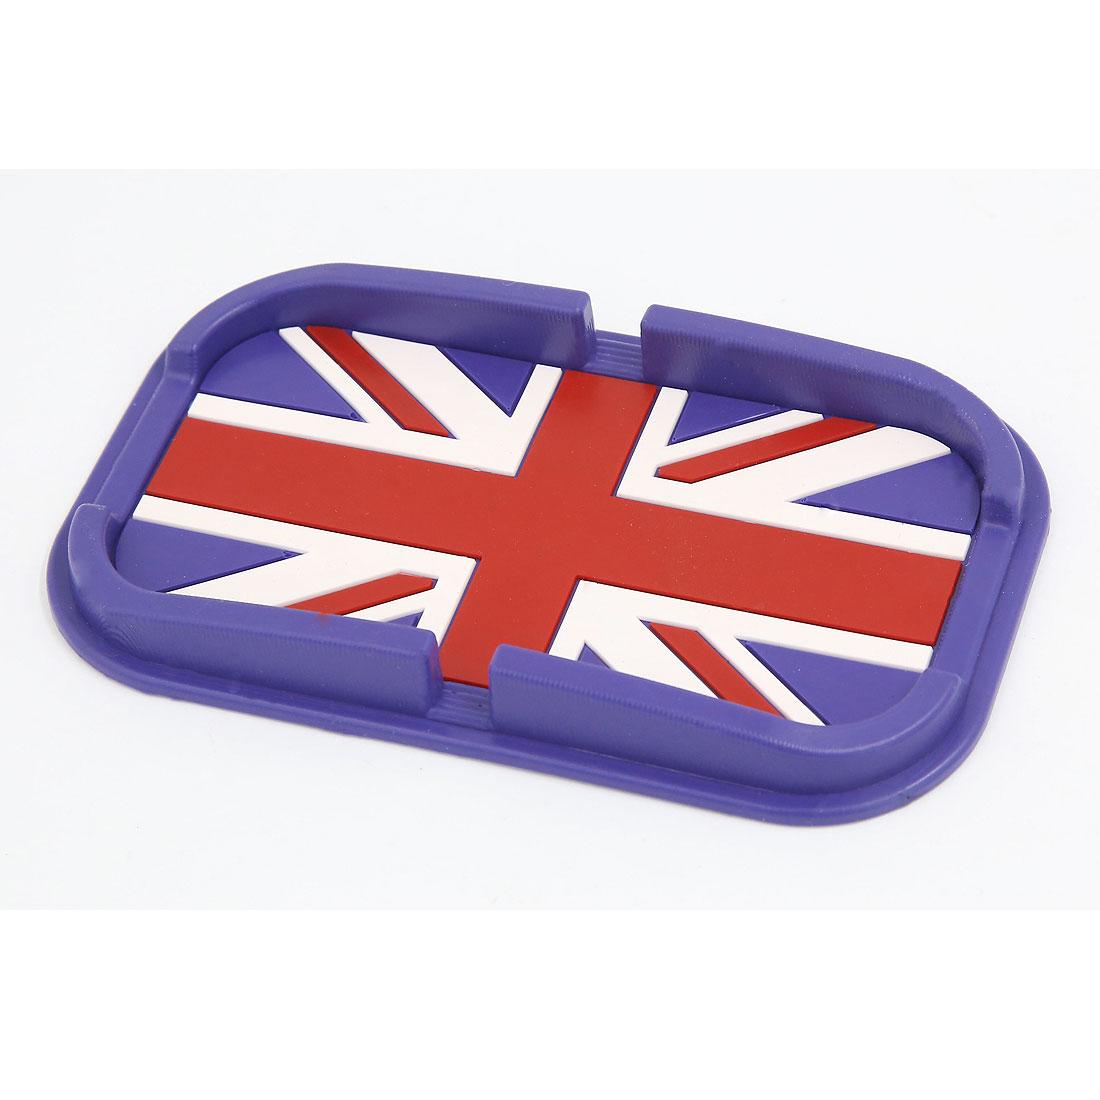 Automobile Navigation Purple Rubber British Flag Pattern Non-Slip Pad Mat Holder